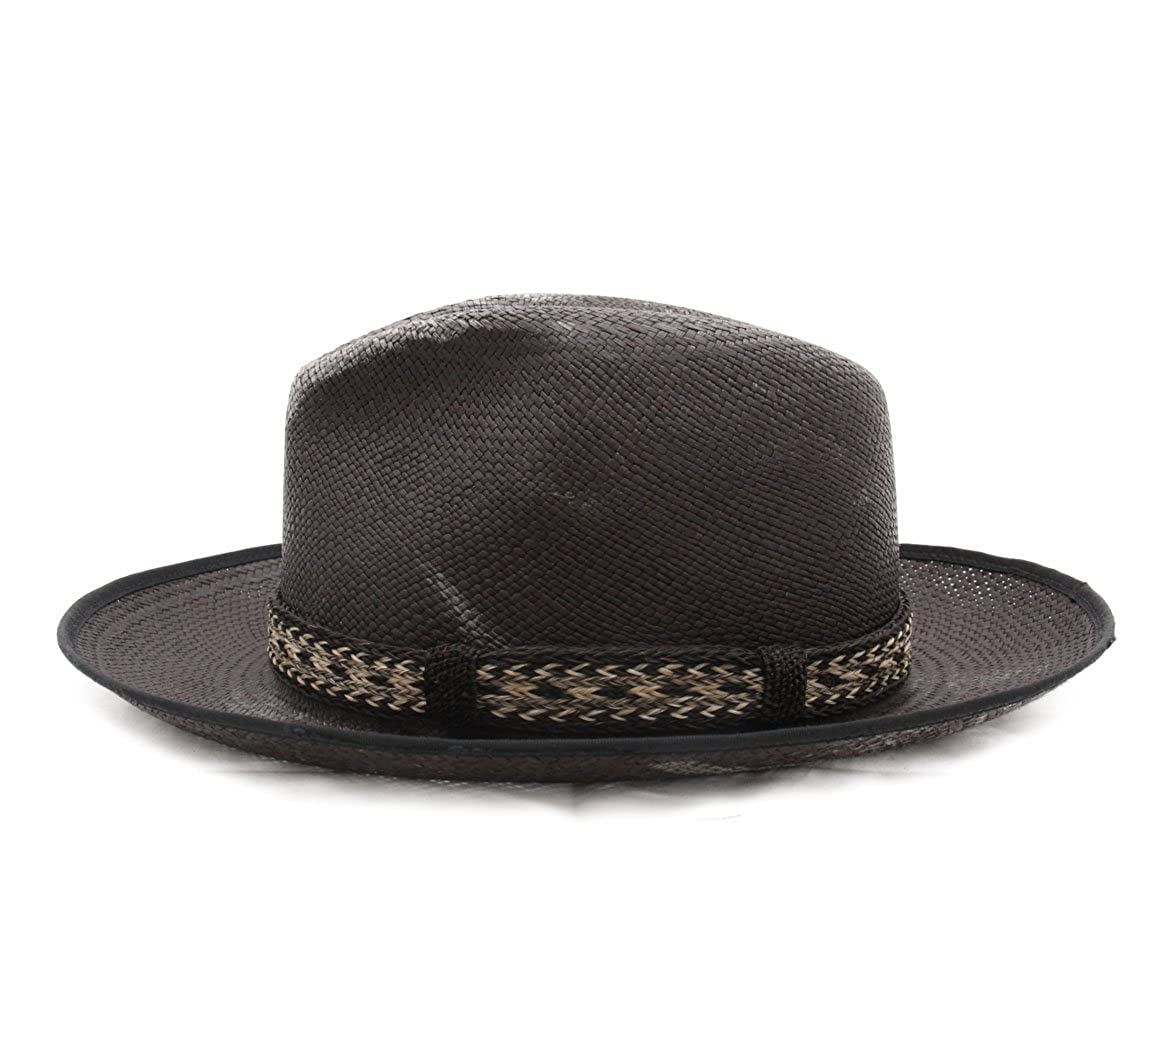 Bailey of Hollywood Grimmer Fedora Hat Wide Brim